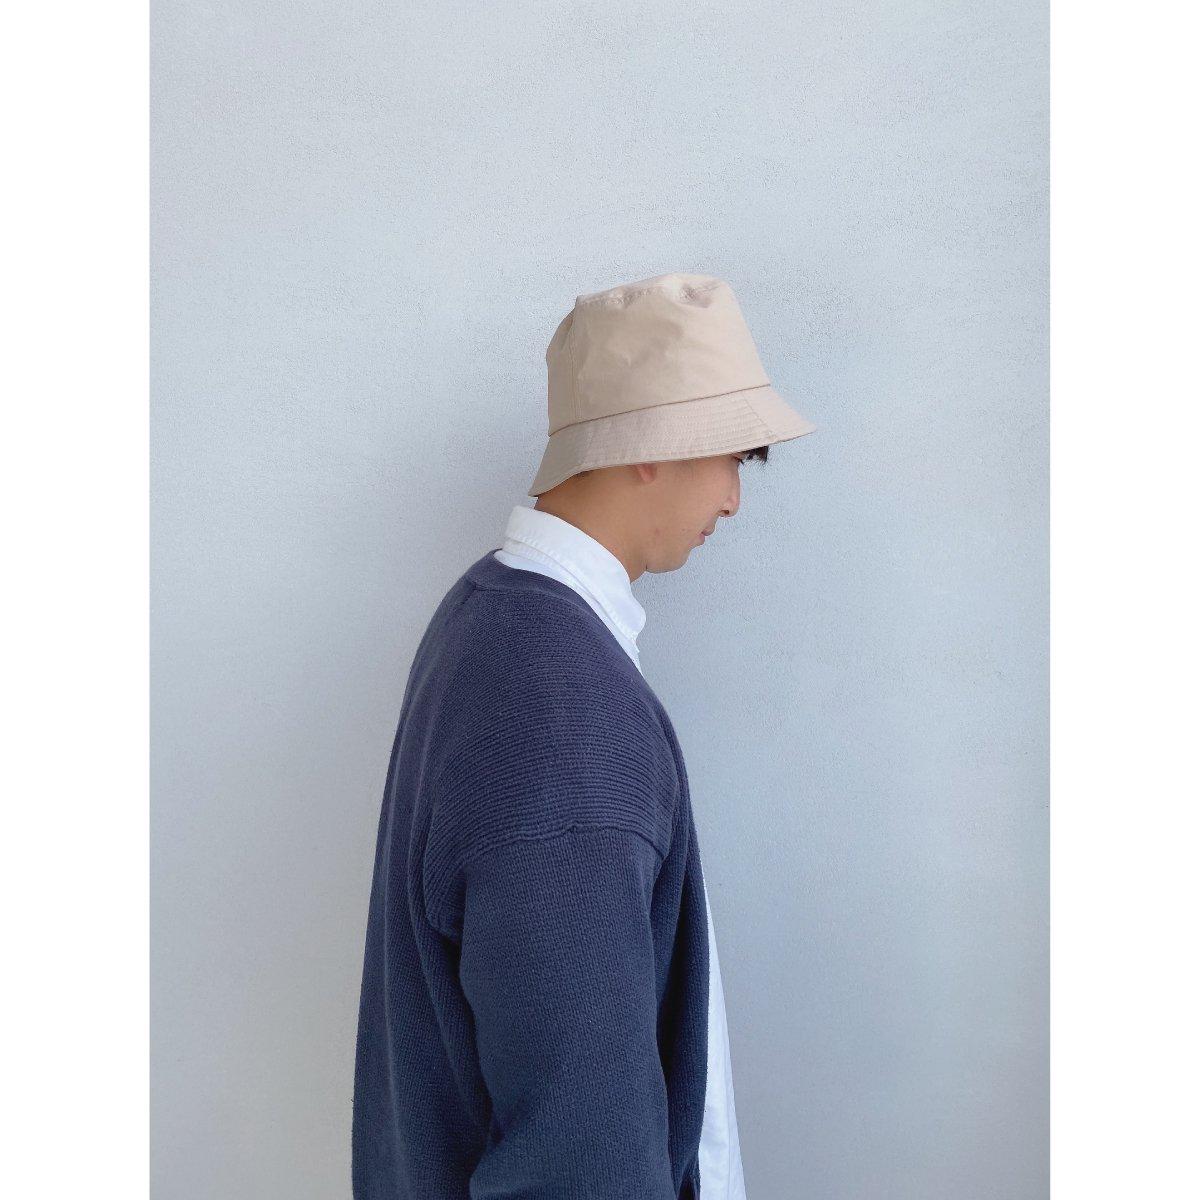 Genius BK Hat 詳細画像22